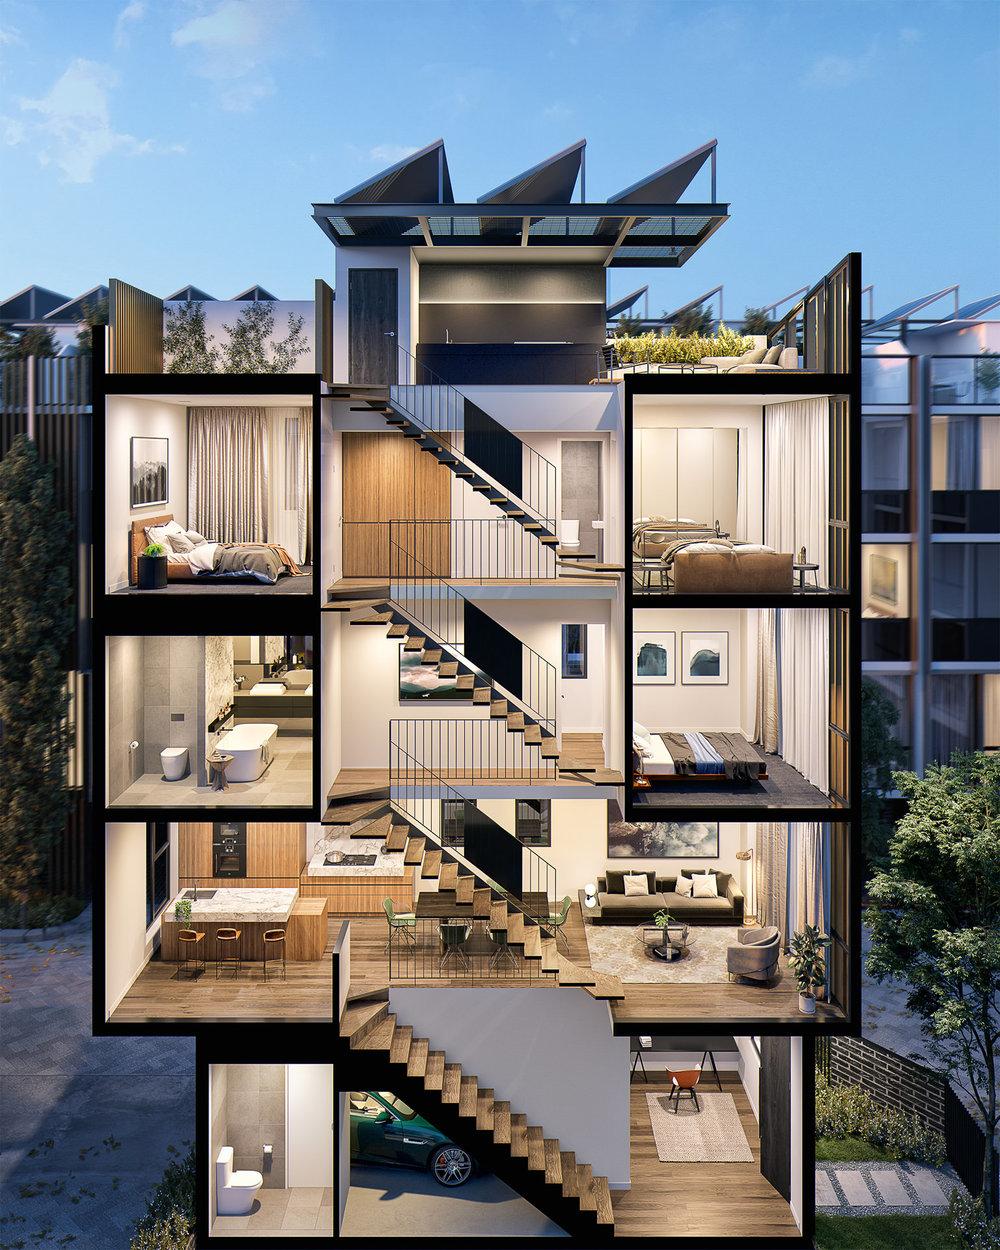 Habitus - 10-16 Boundary Street, South Melbourne, Victoria, Aust